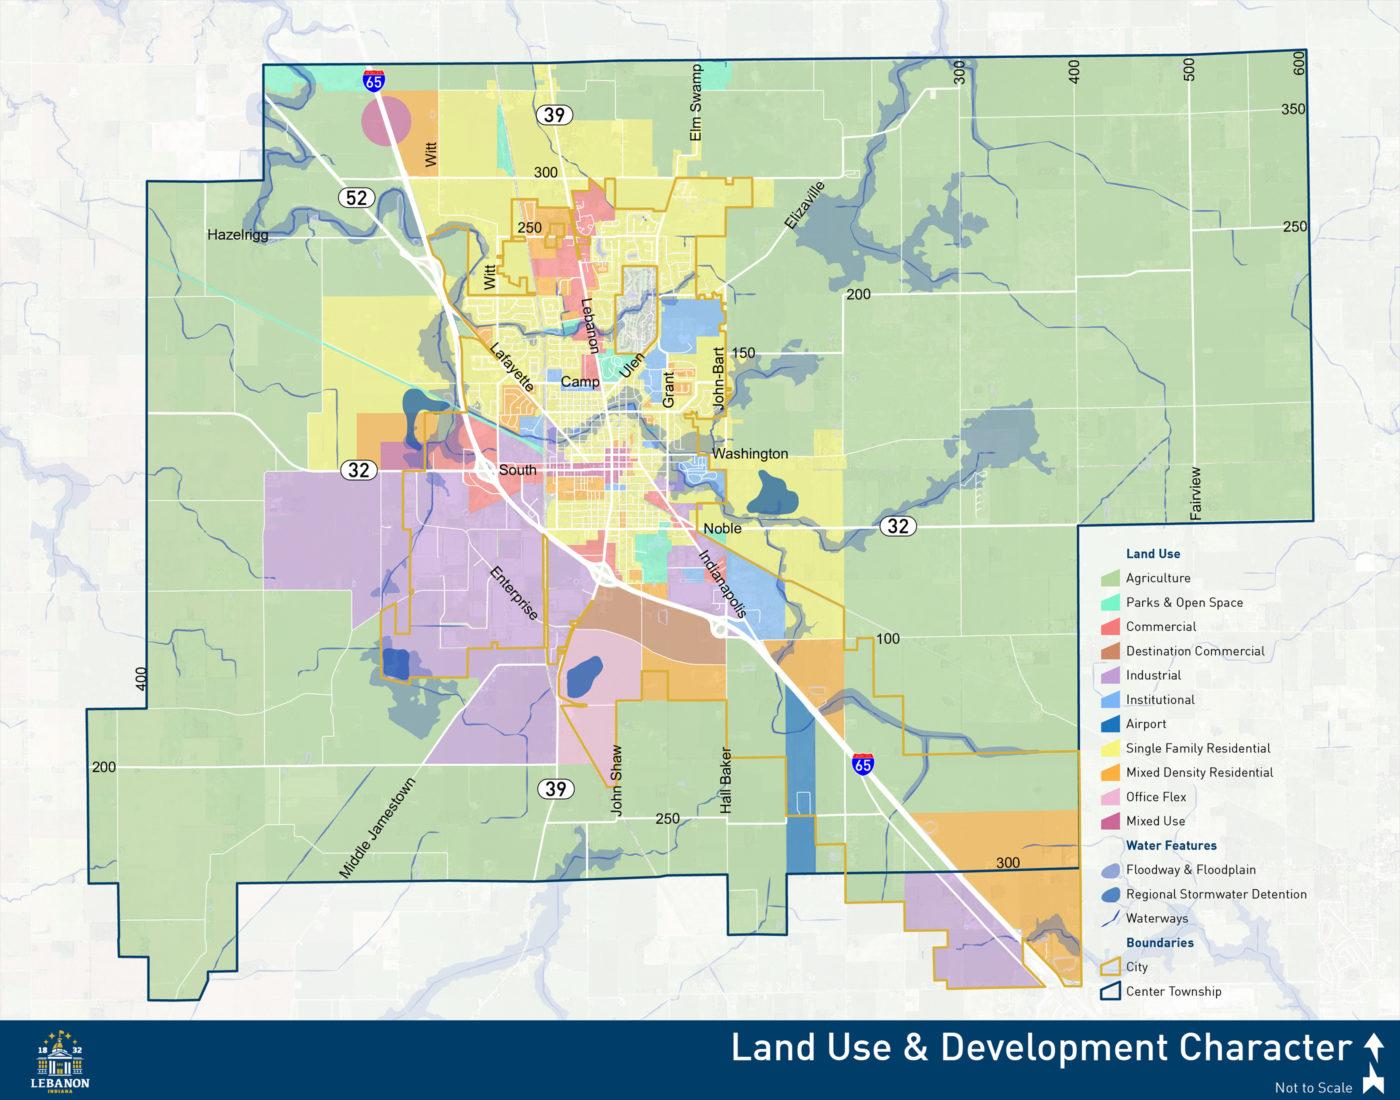 LAND USE & DEVELOPMENT CHARACTER